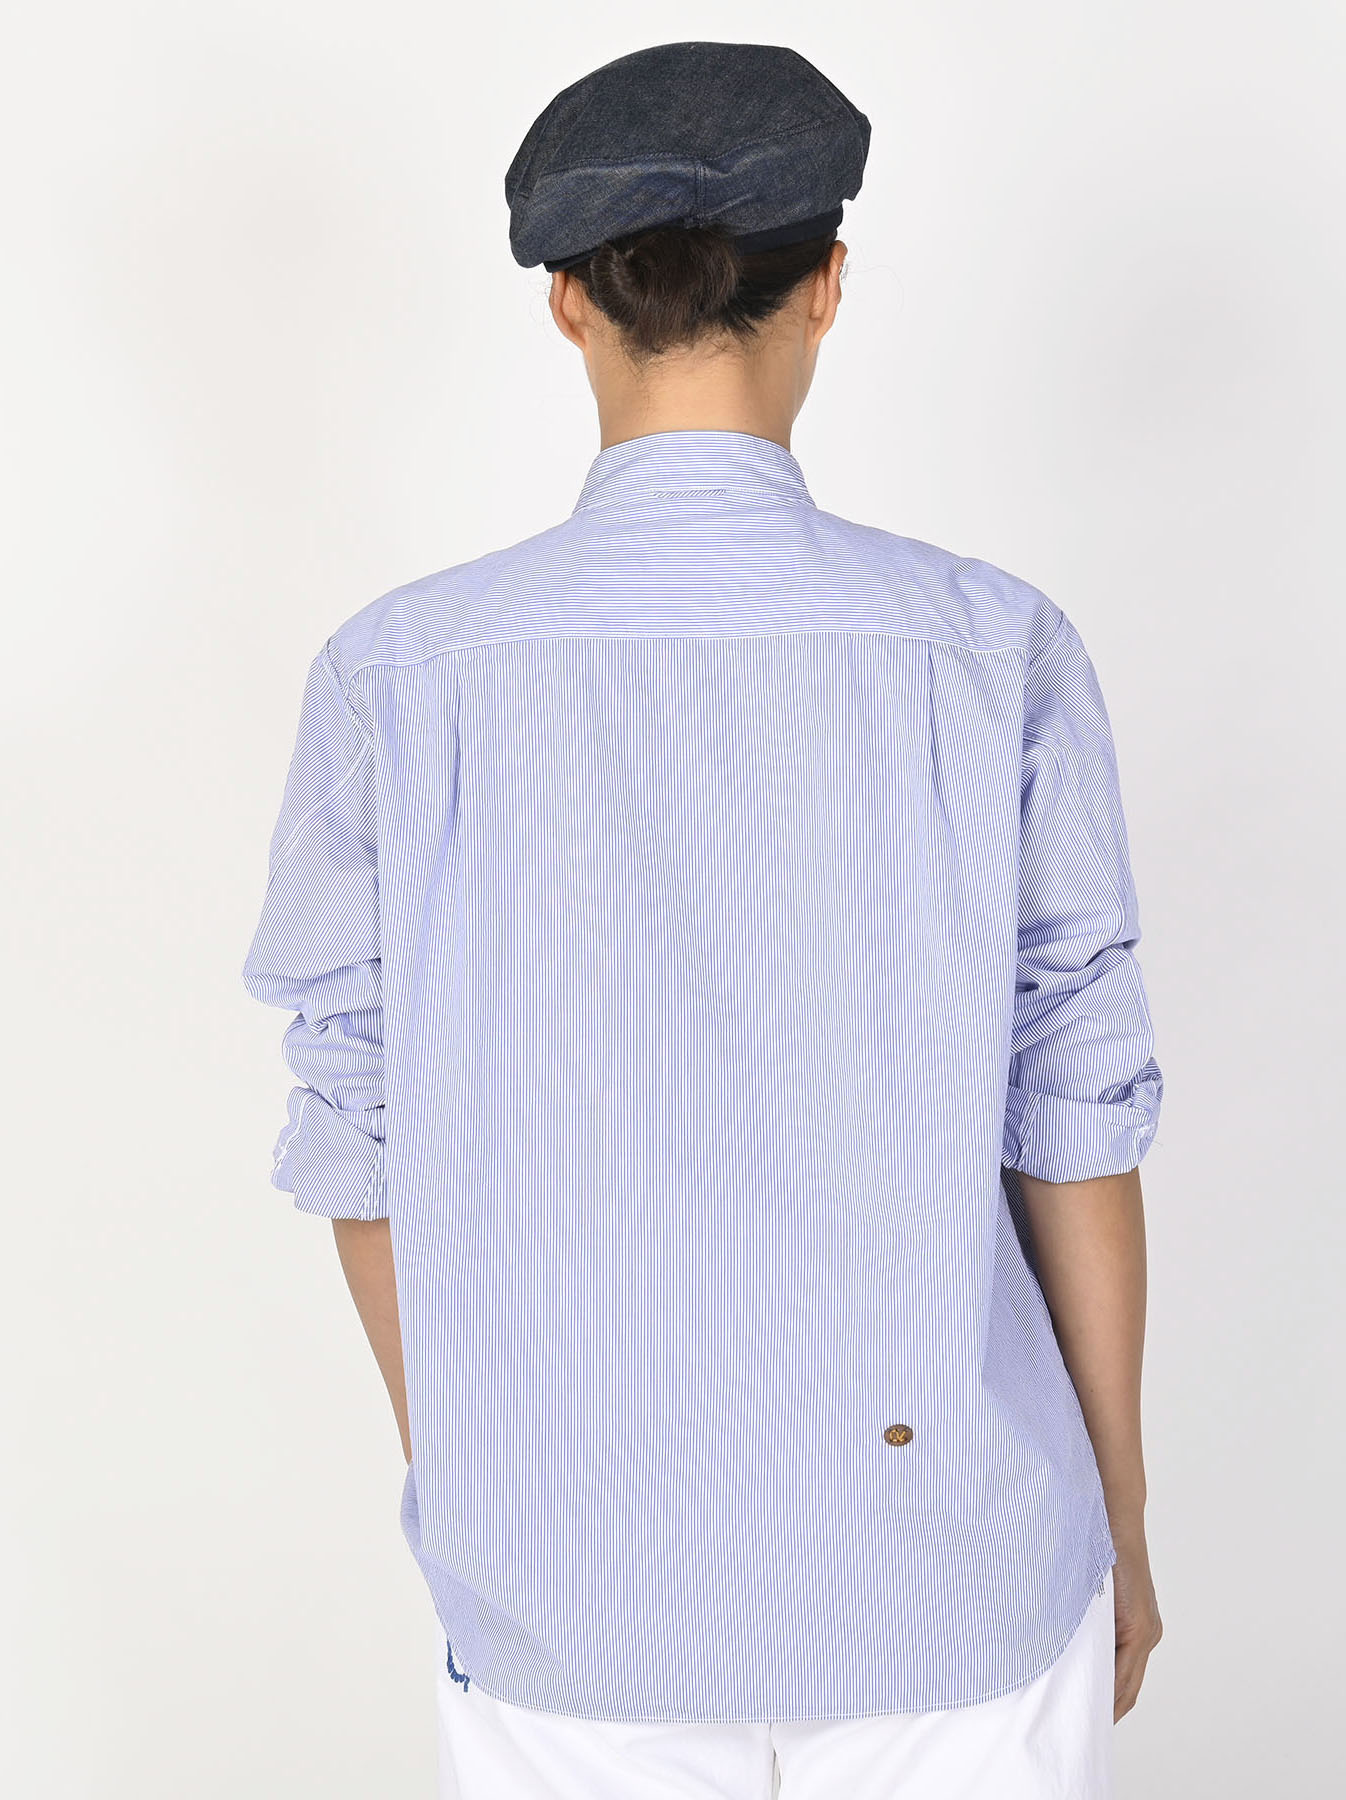 Miko Stand Collar 908 Ocean Shirt-5